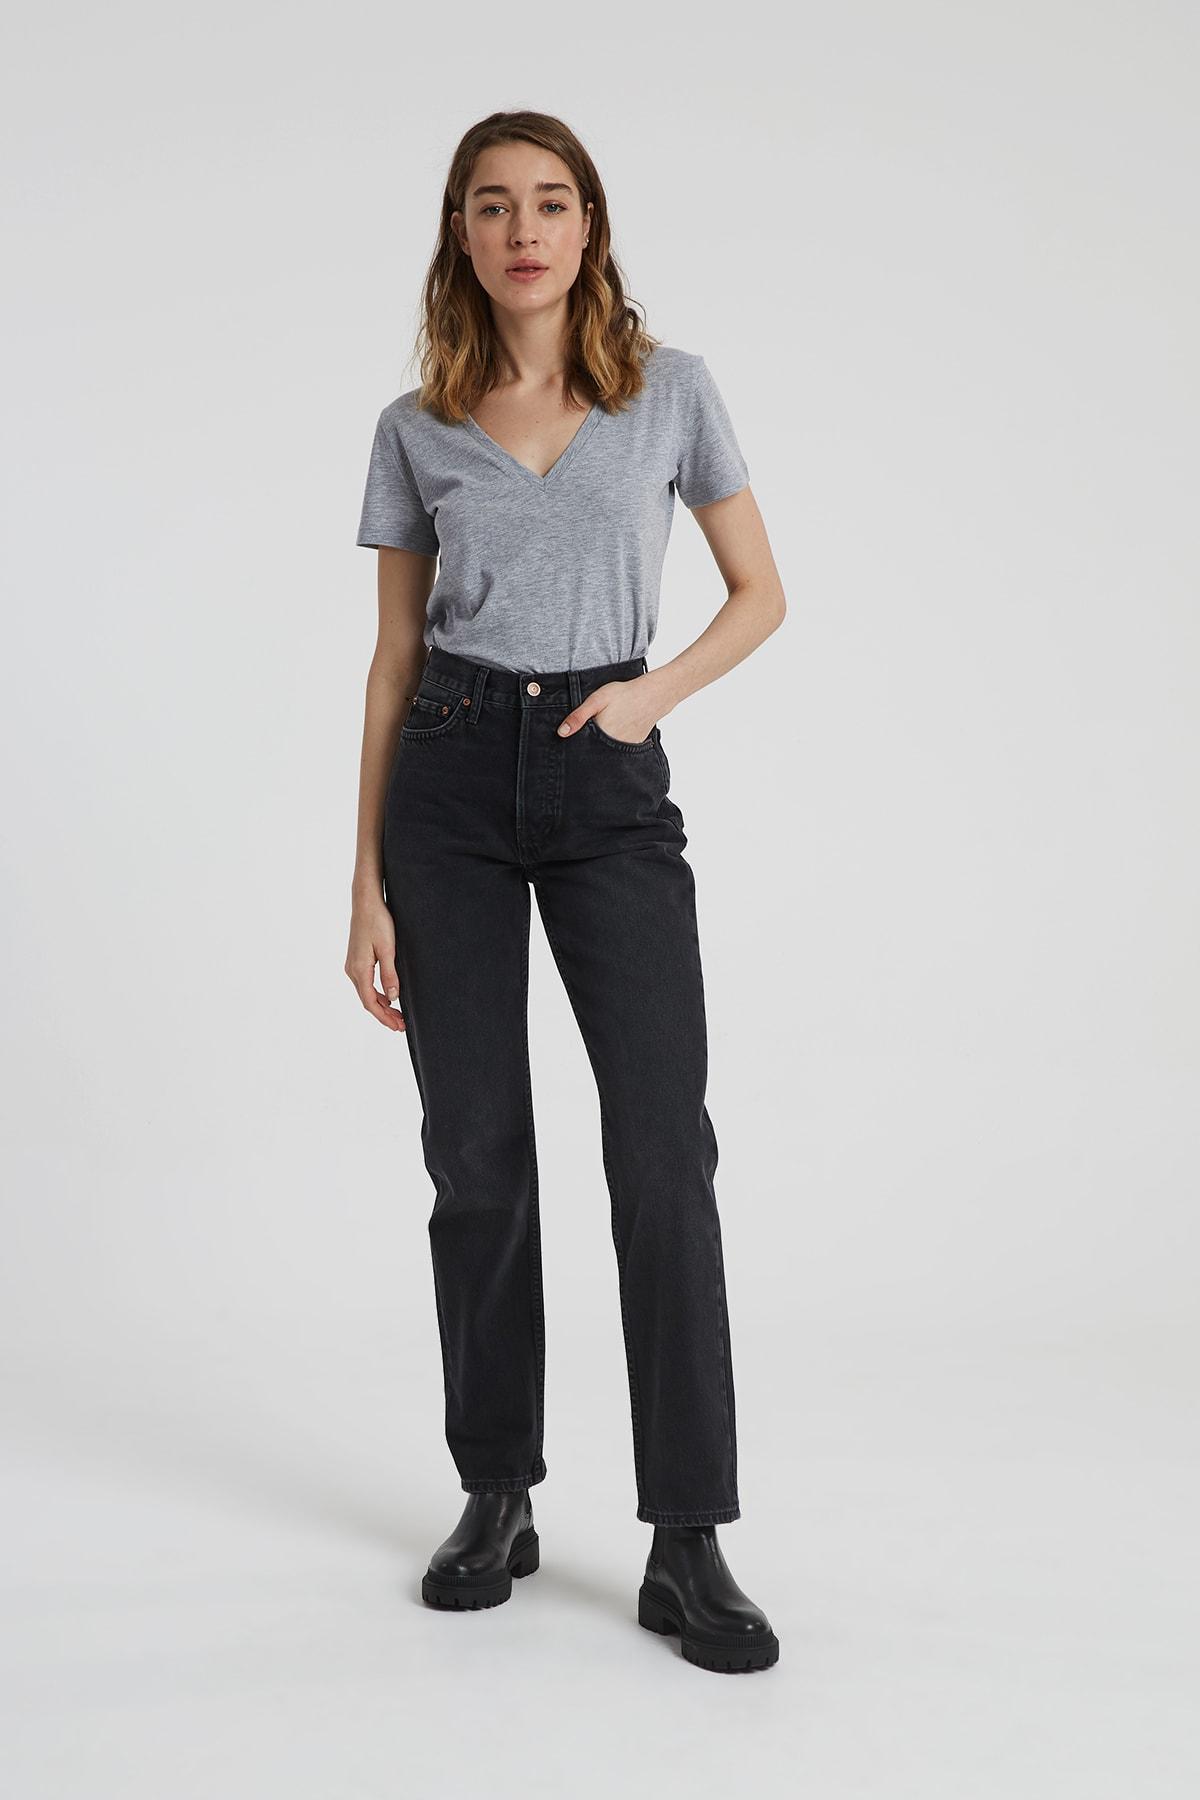 Dıana Siyah Renk Yüksel Bel Dad Straight Fit Pantolon C 4517-007